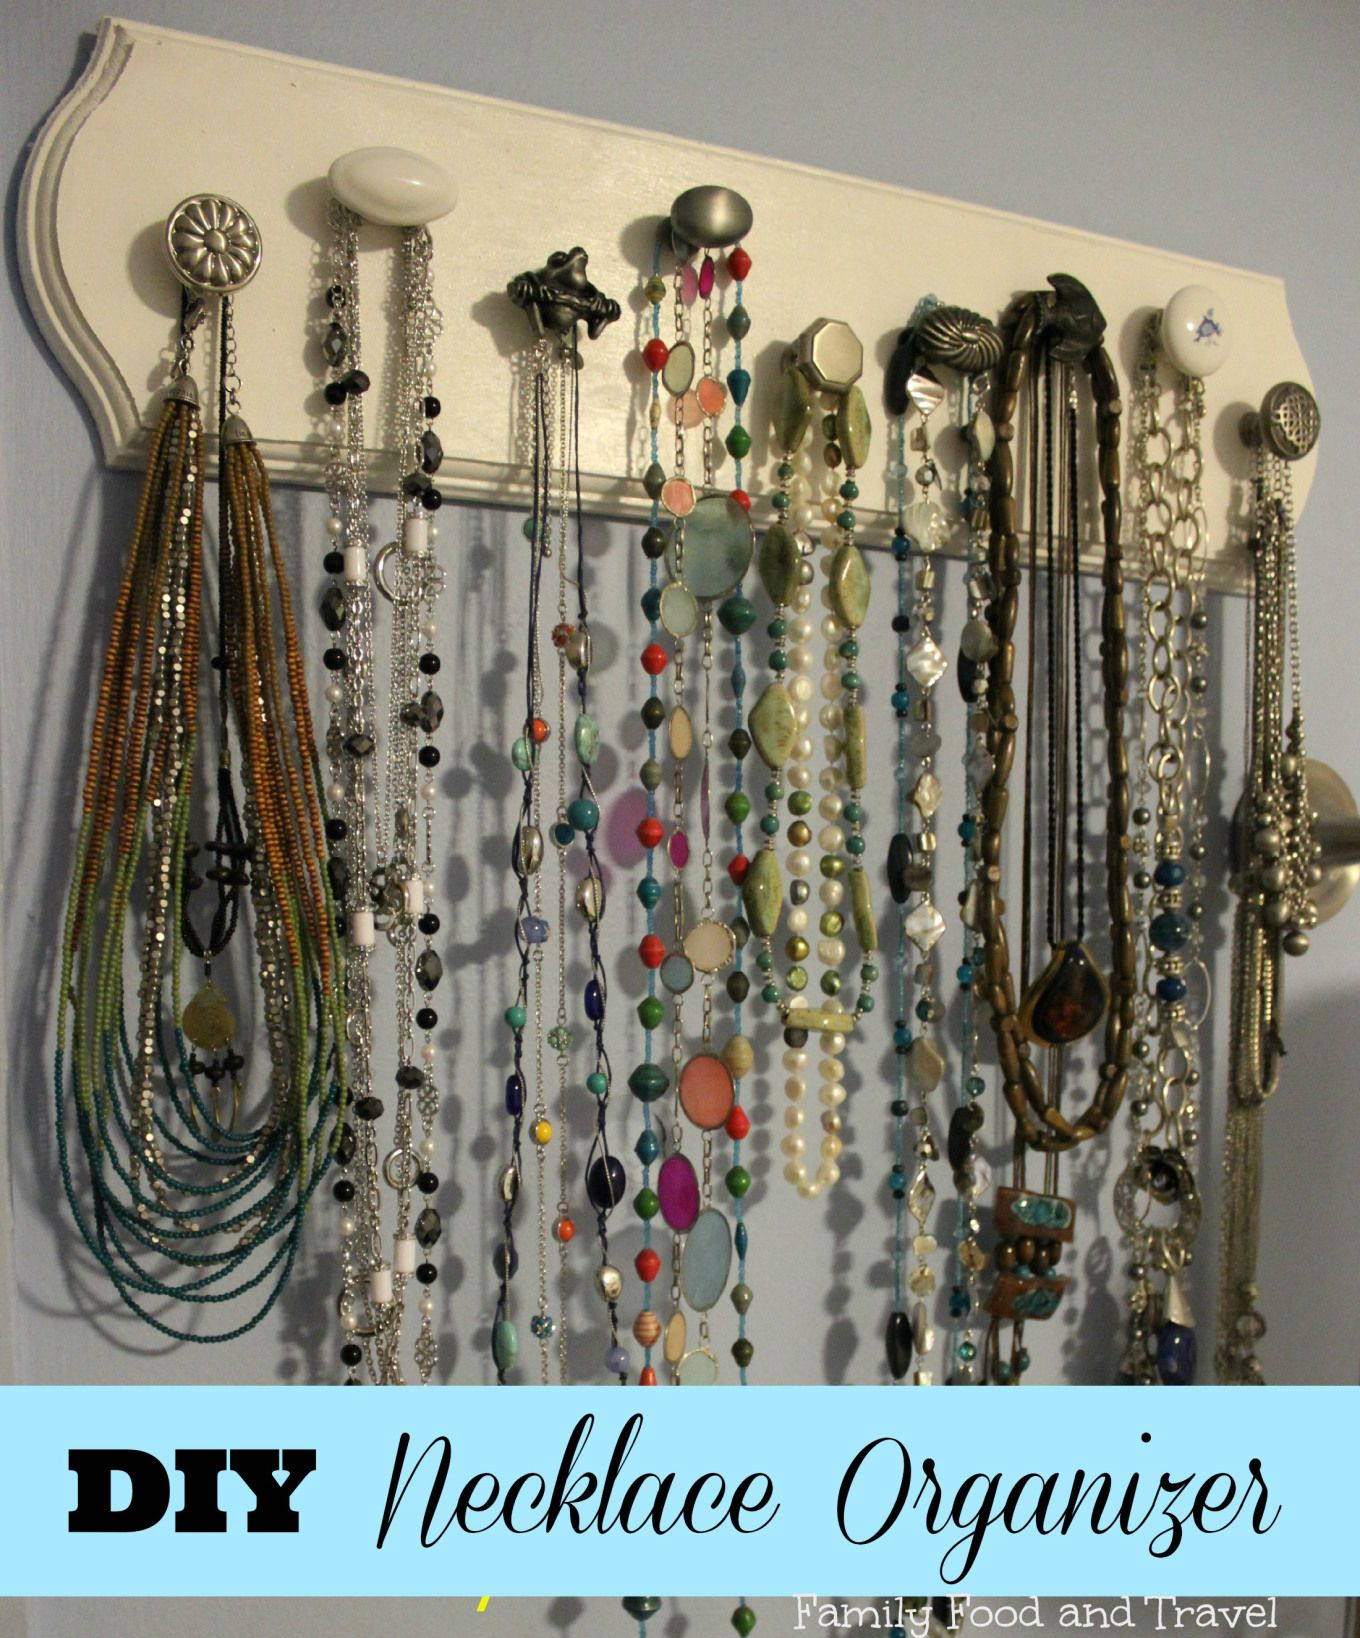 DIY Necklace Organizer Diy necklace Board paint and Organizations